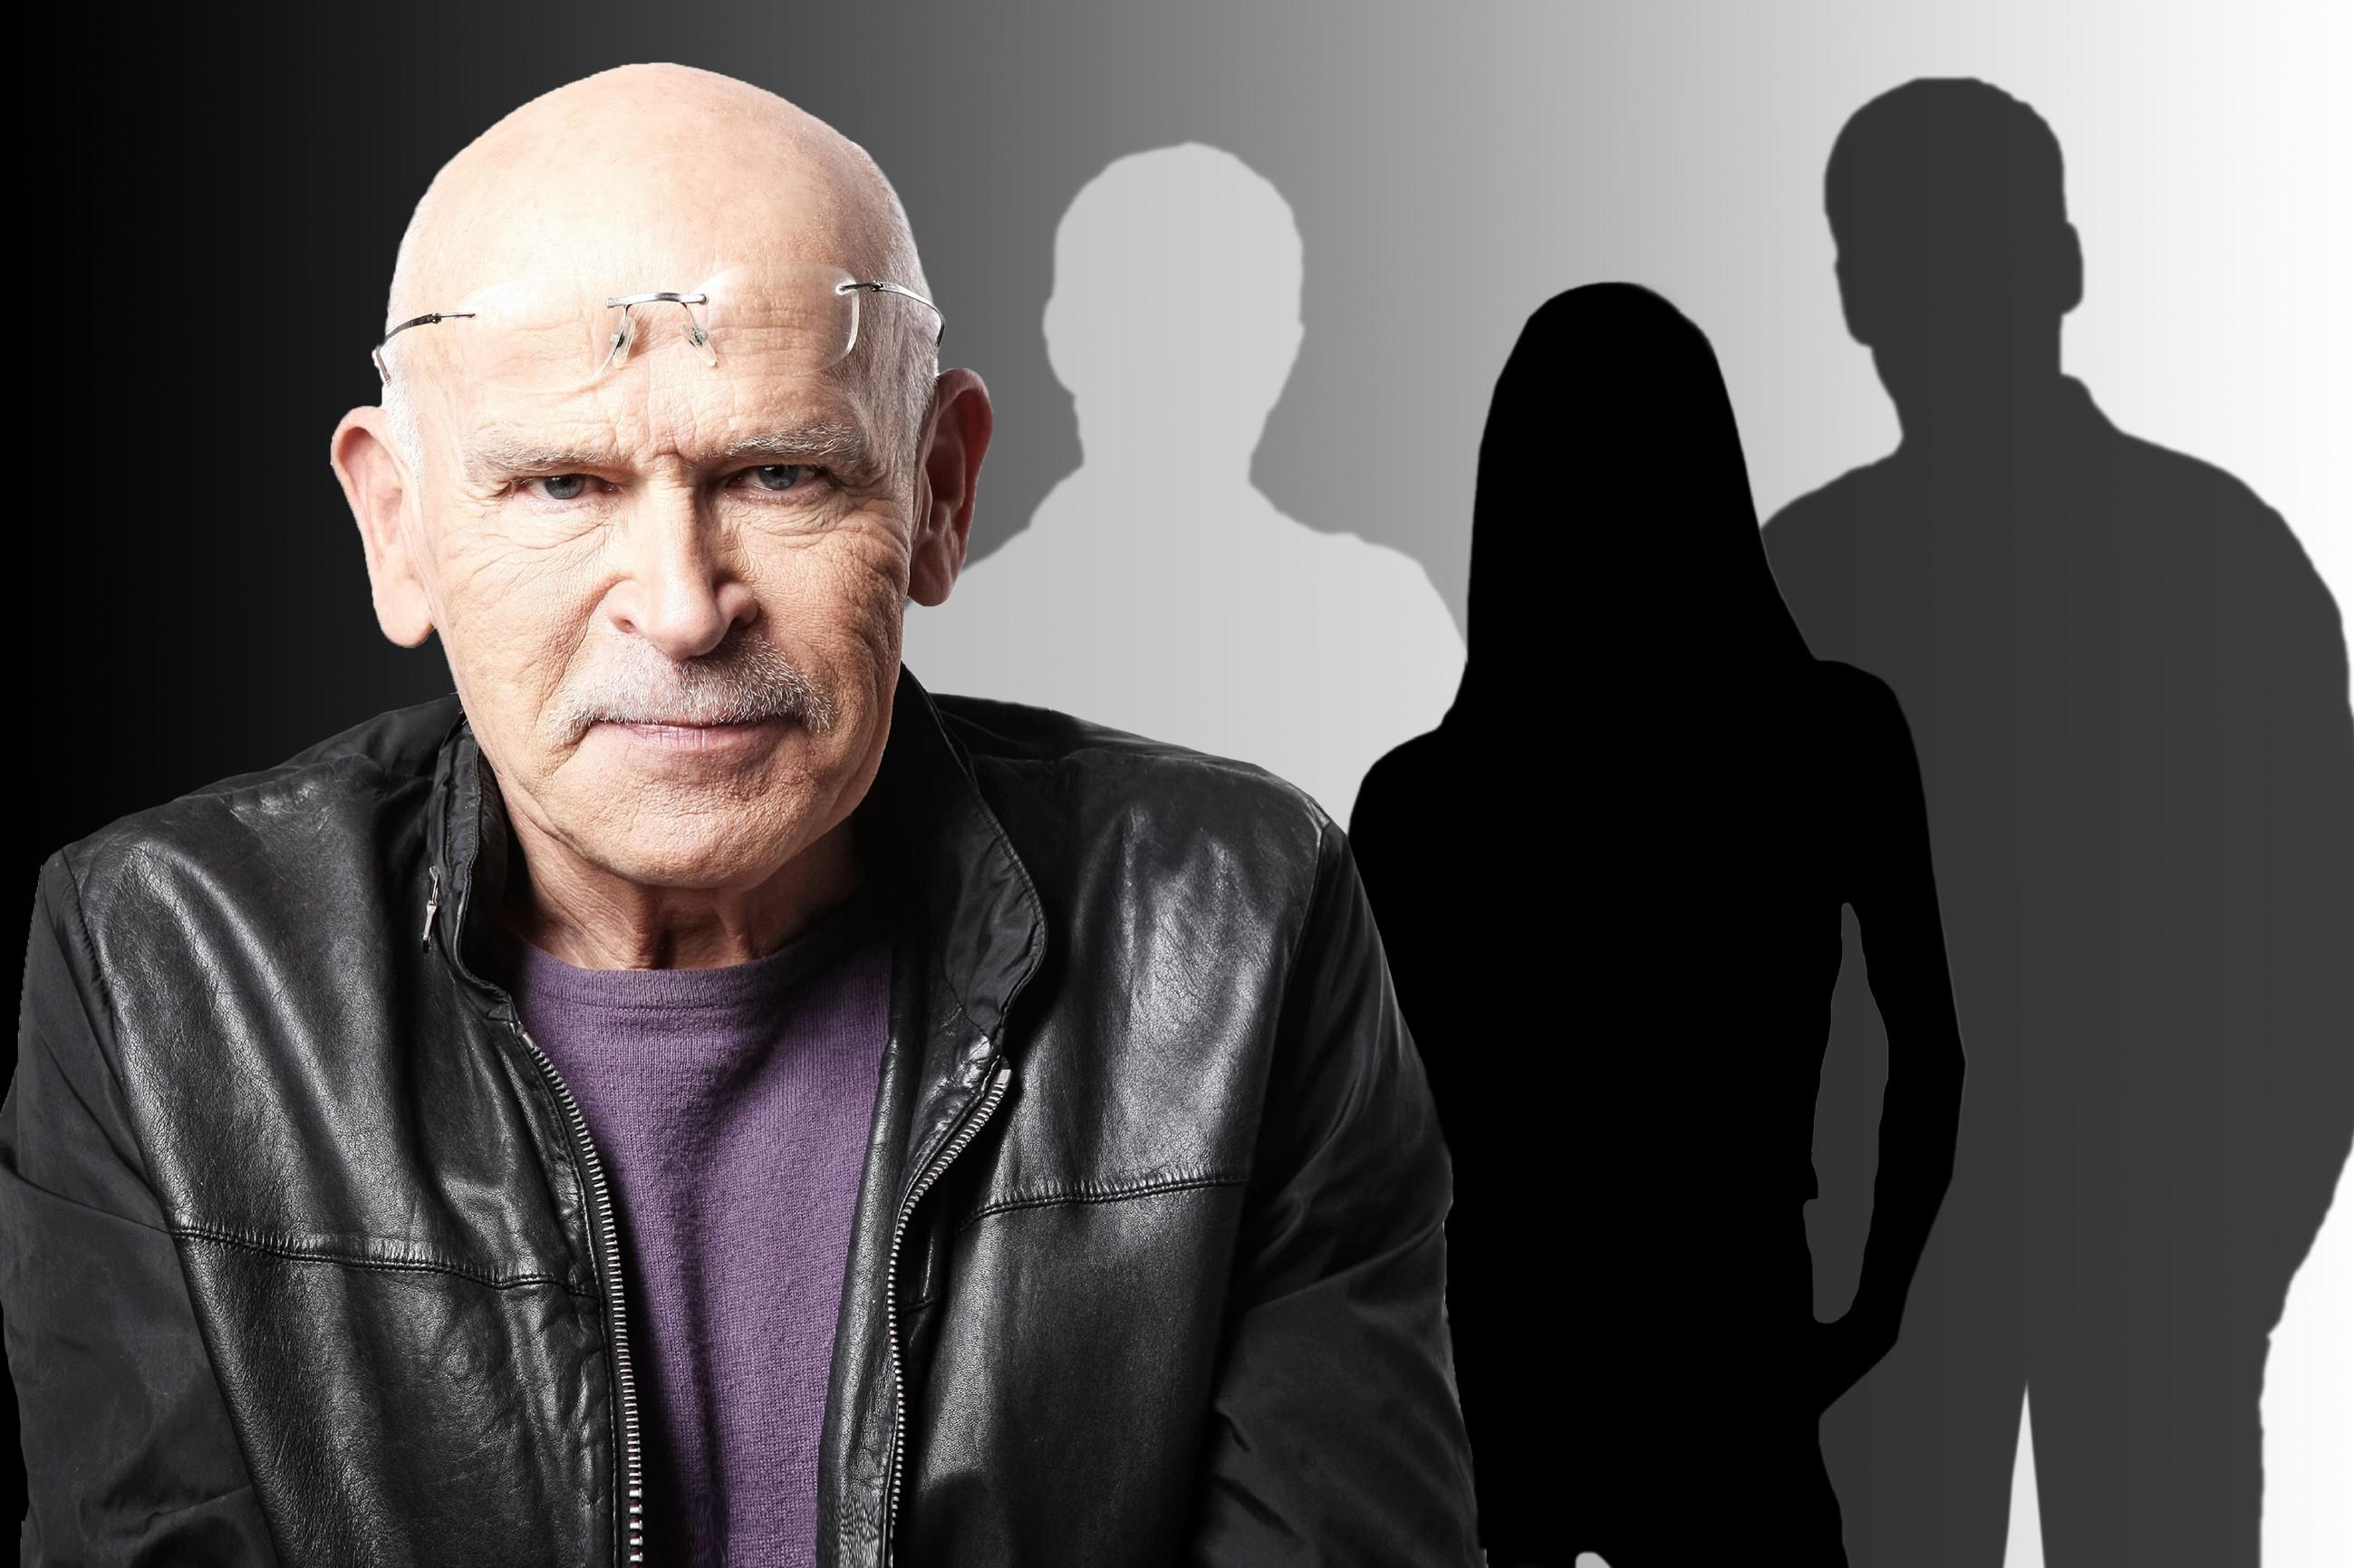 Team Wallraff – Reporter Undercover in Altenpflegeheimen